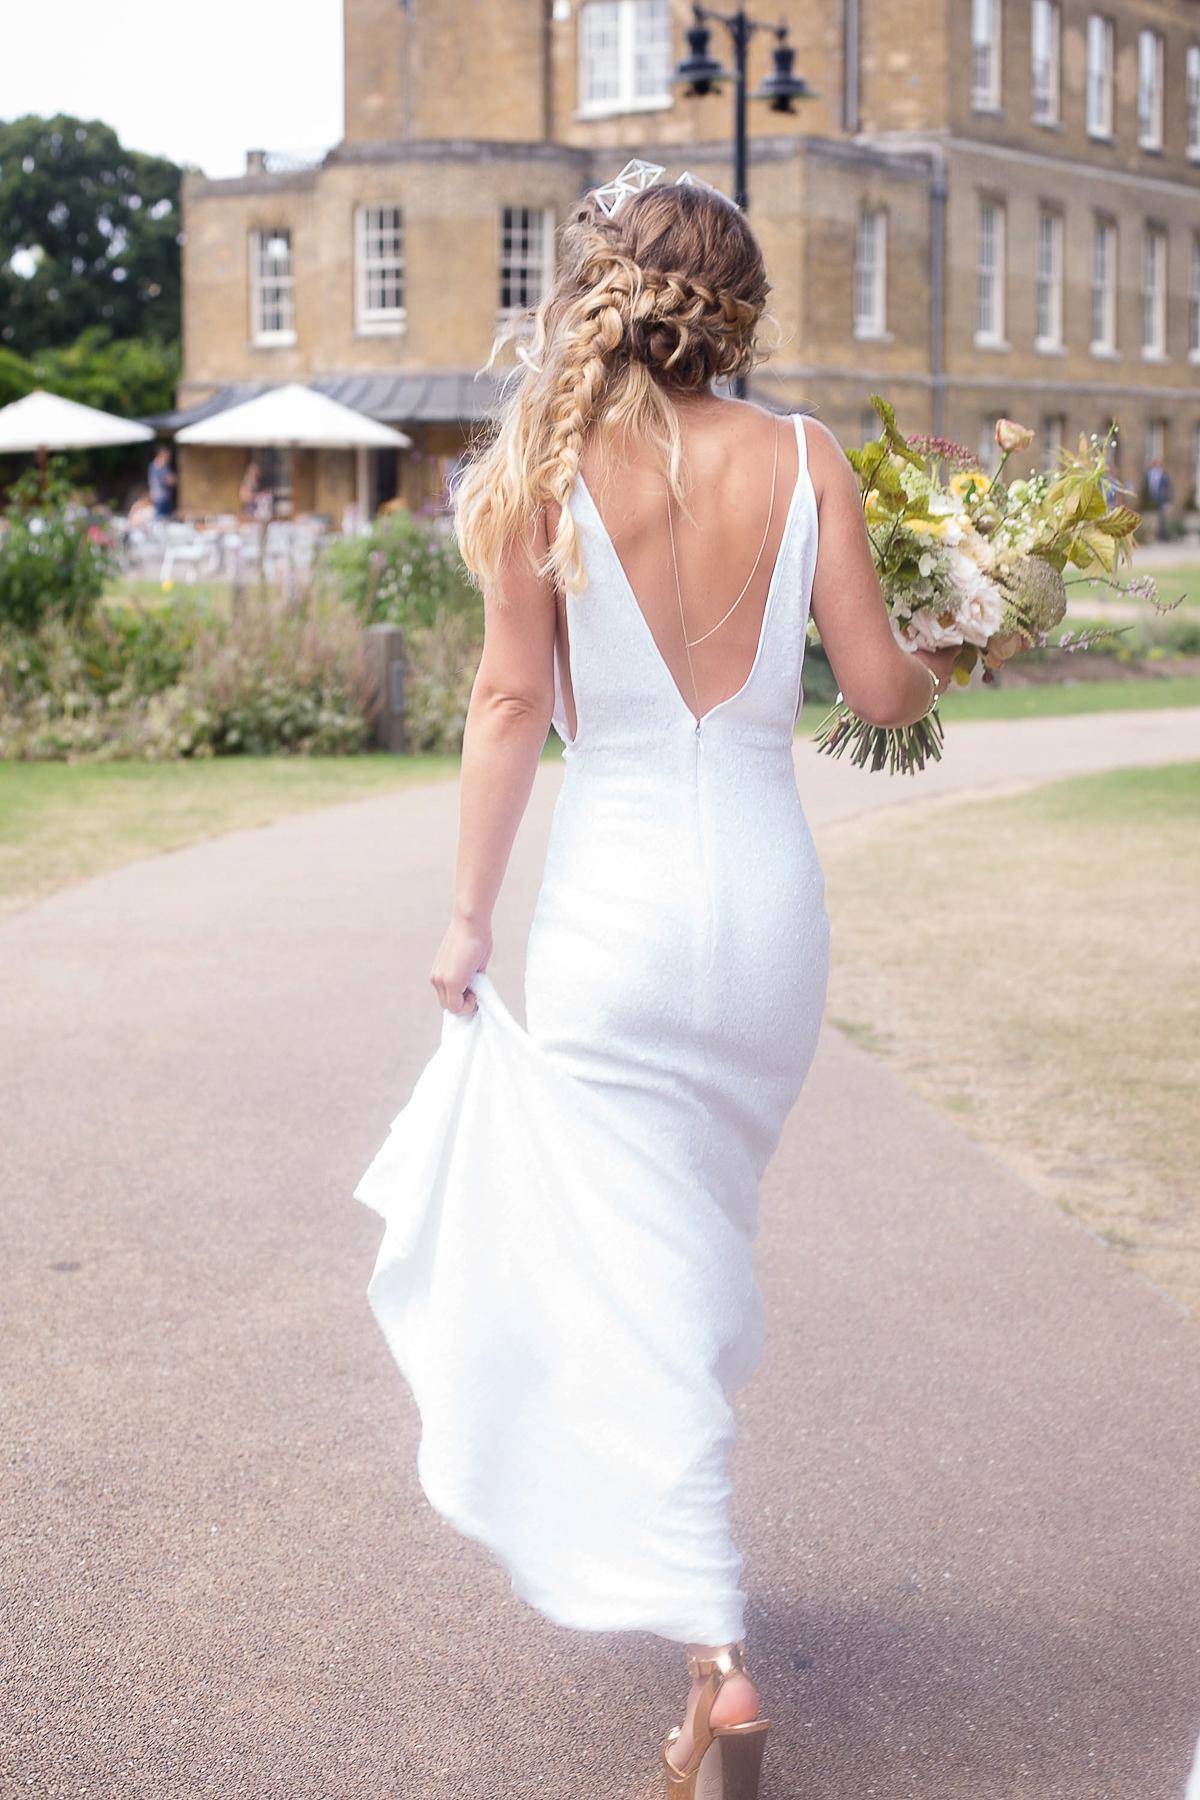 And-For-Love-wedding-dress-12.jpg